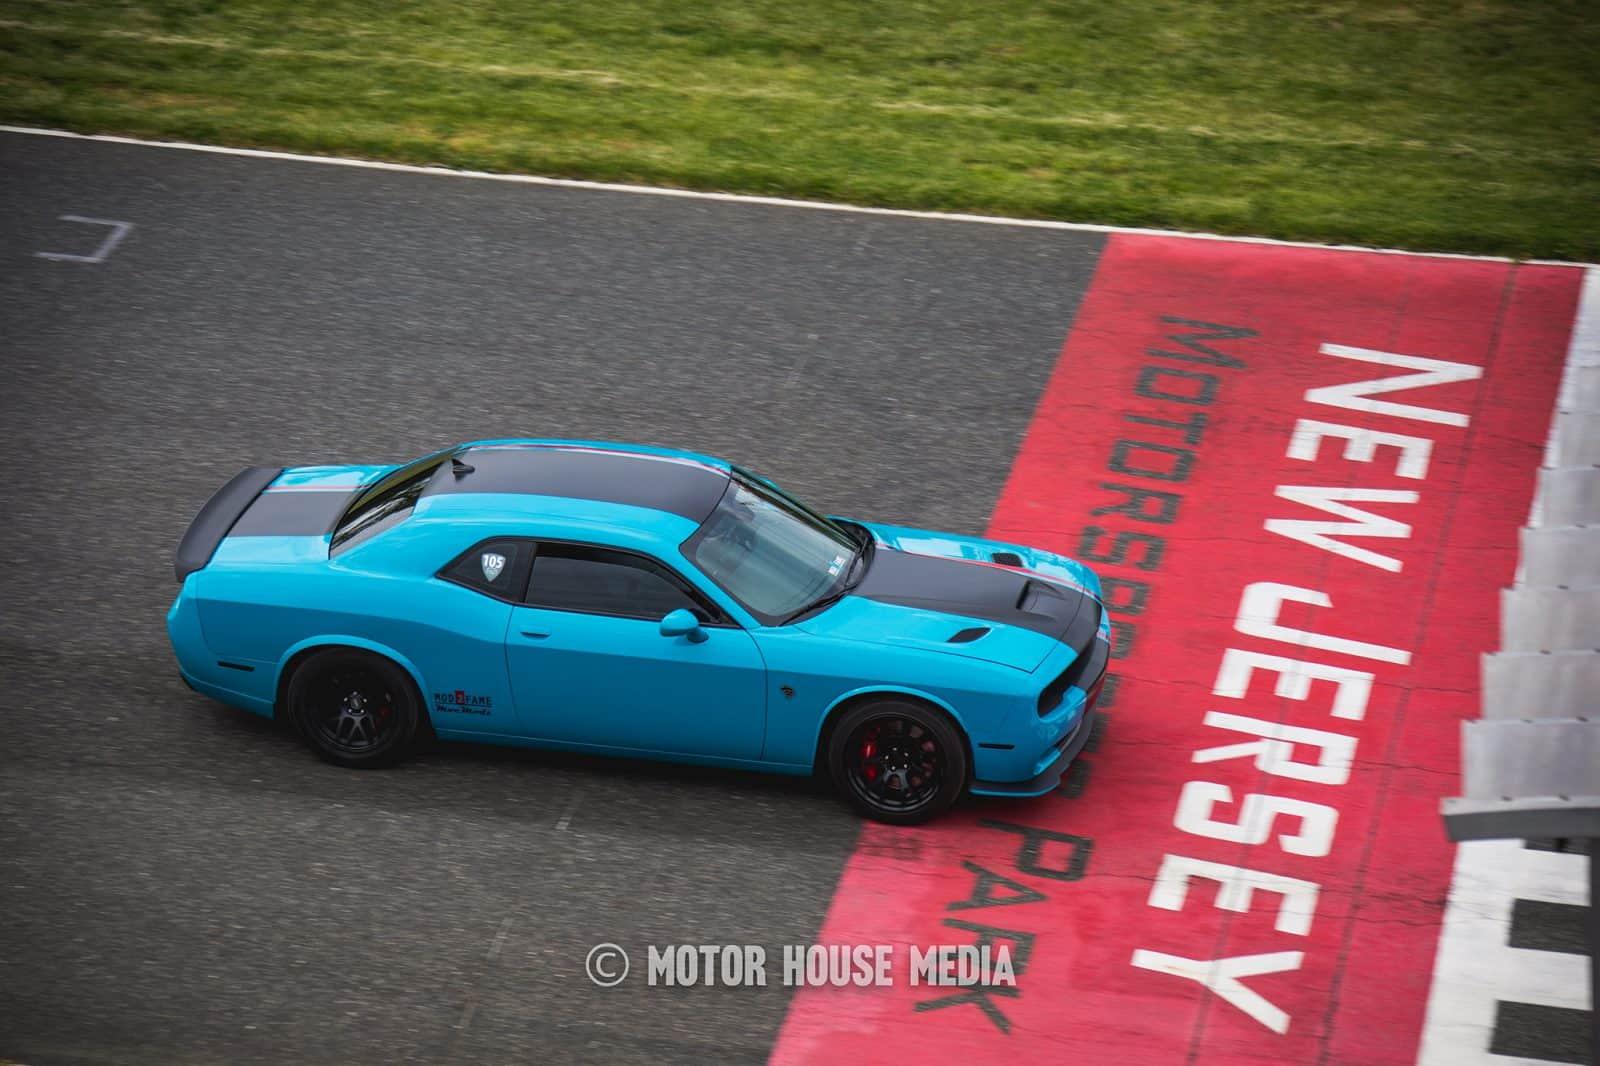 Challenger roll racing